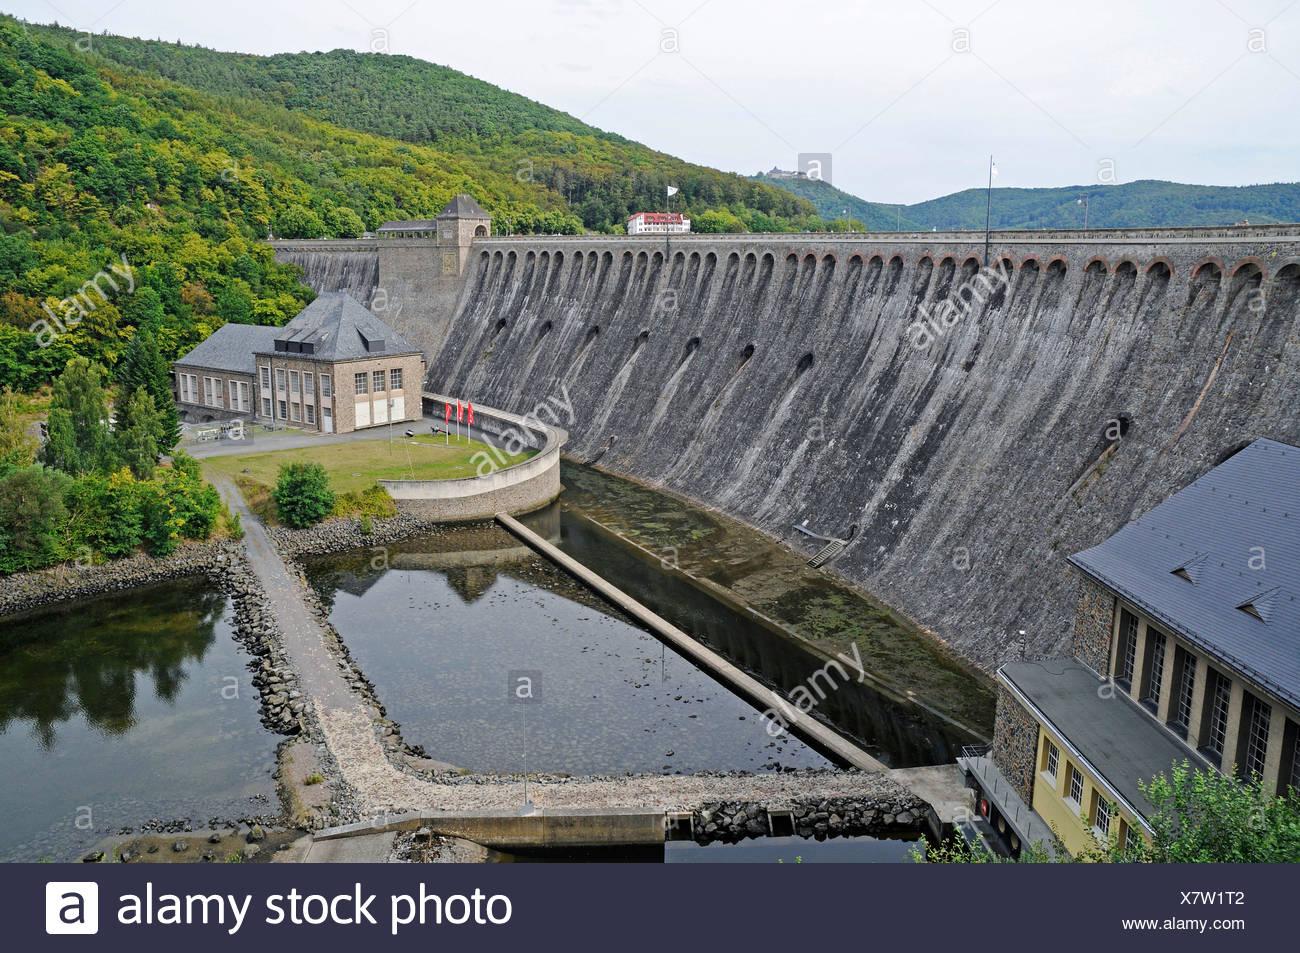 Dam, Edersee lake, Eder reservoir, power plant Hemfurth, Waldeck, Hesse, Germany, Europe Stock Photo